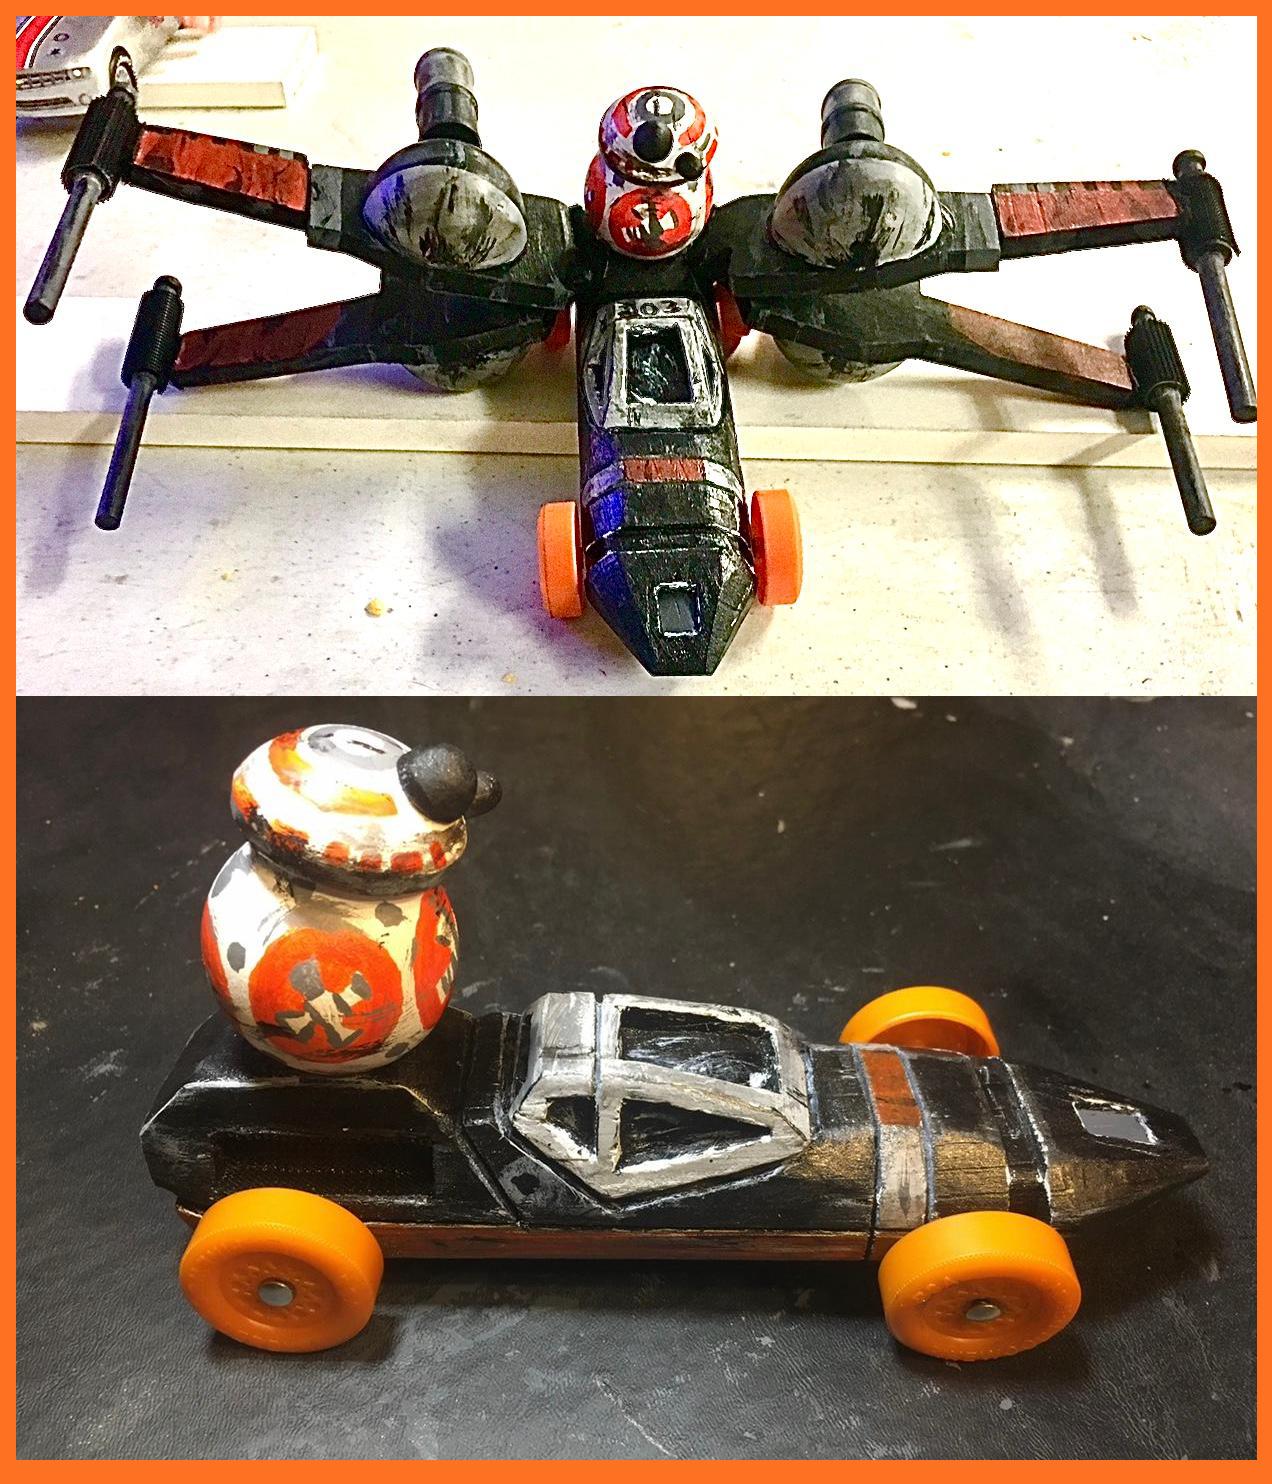 BB8 & Poe's X-Wing